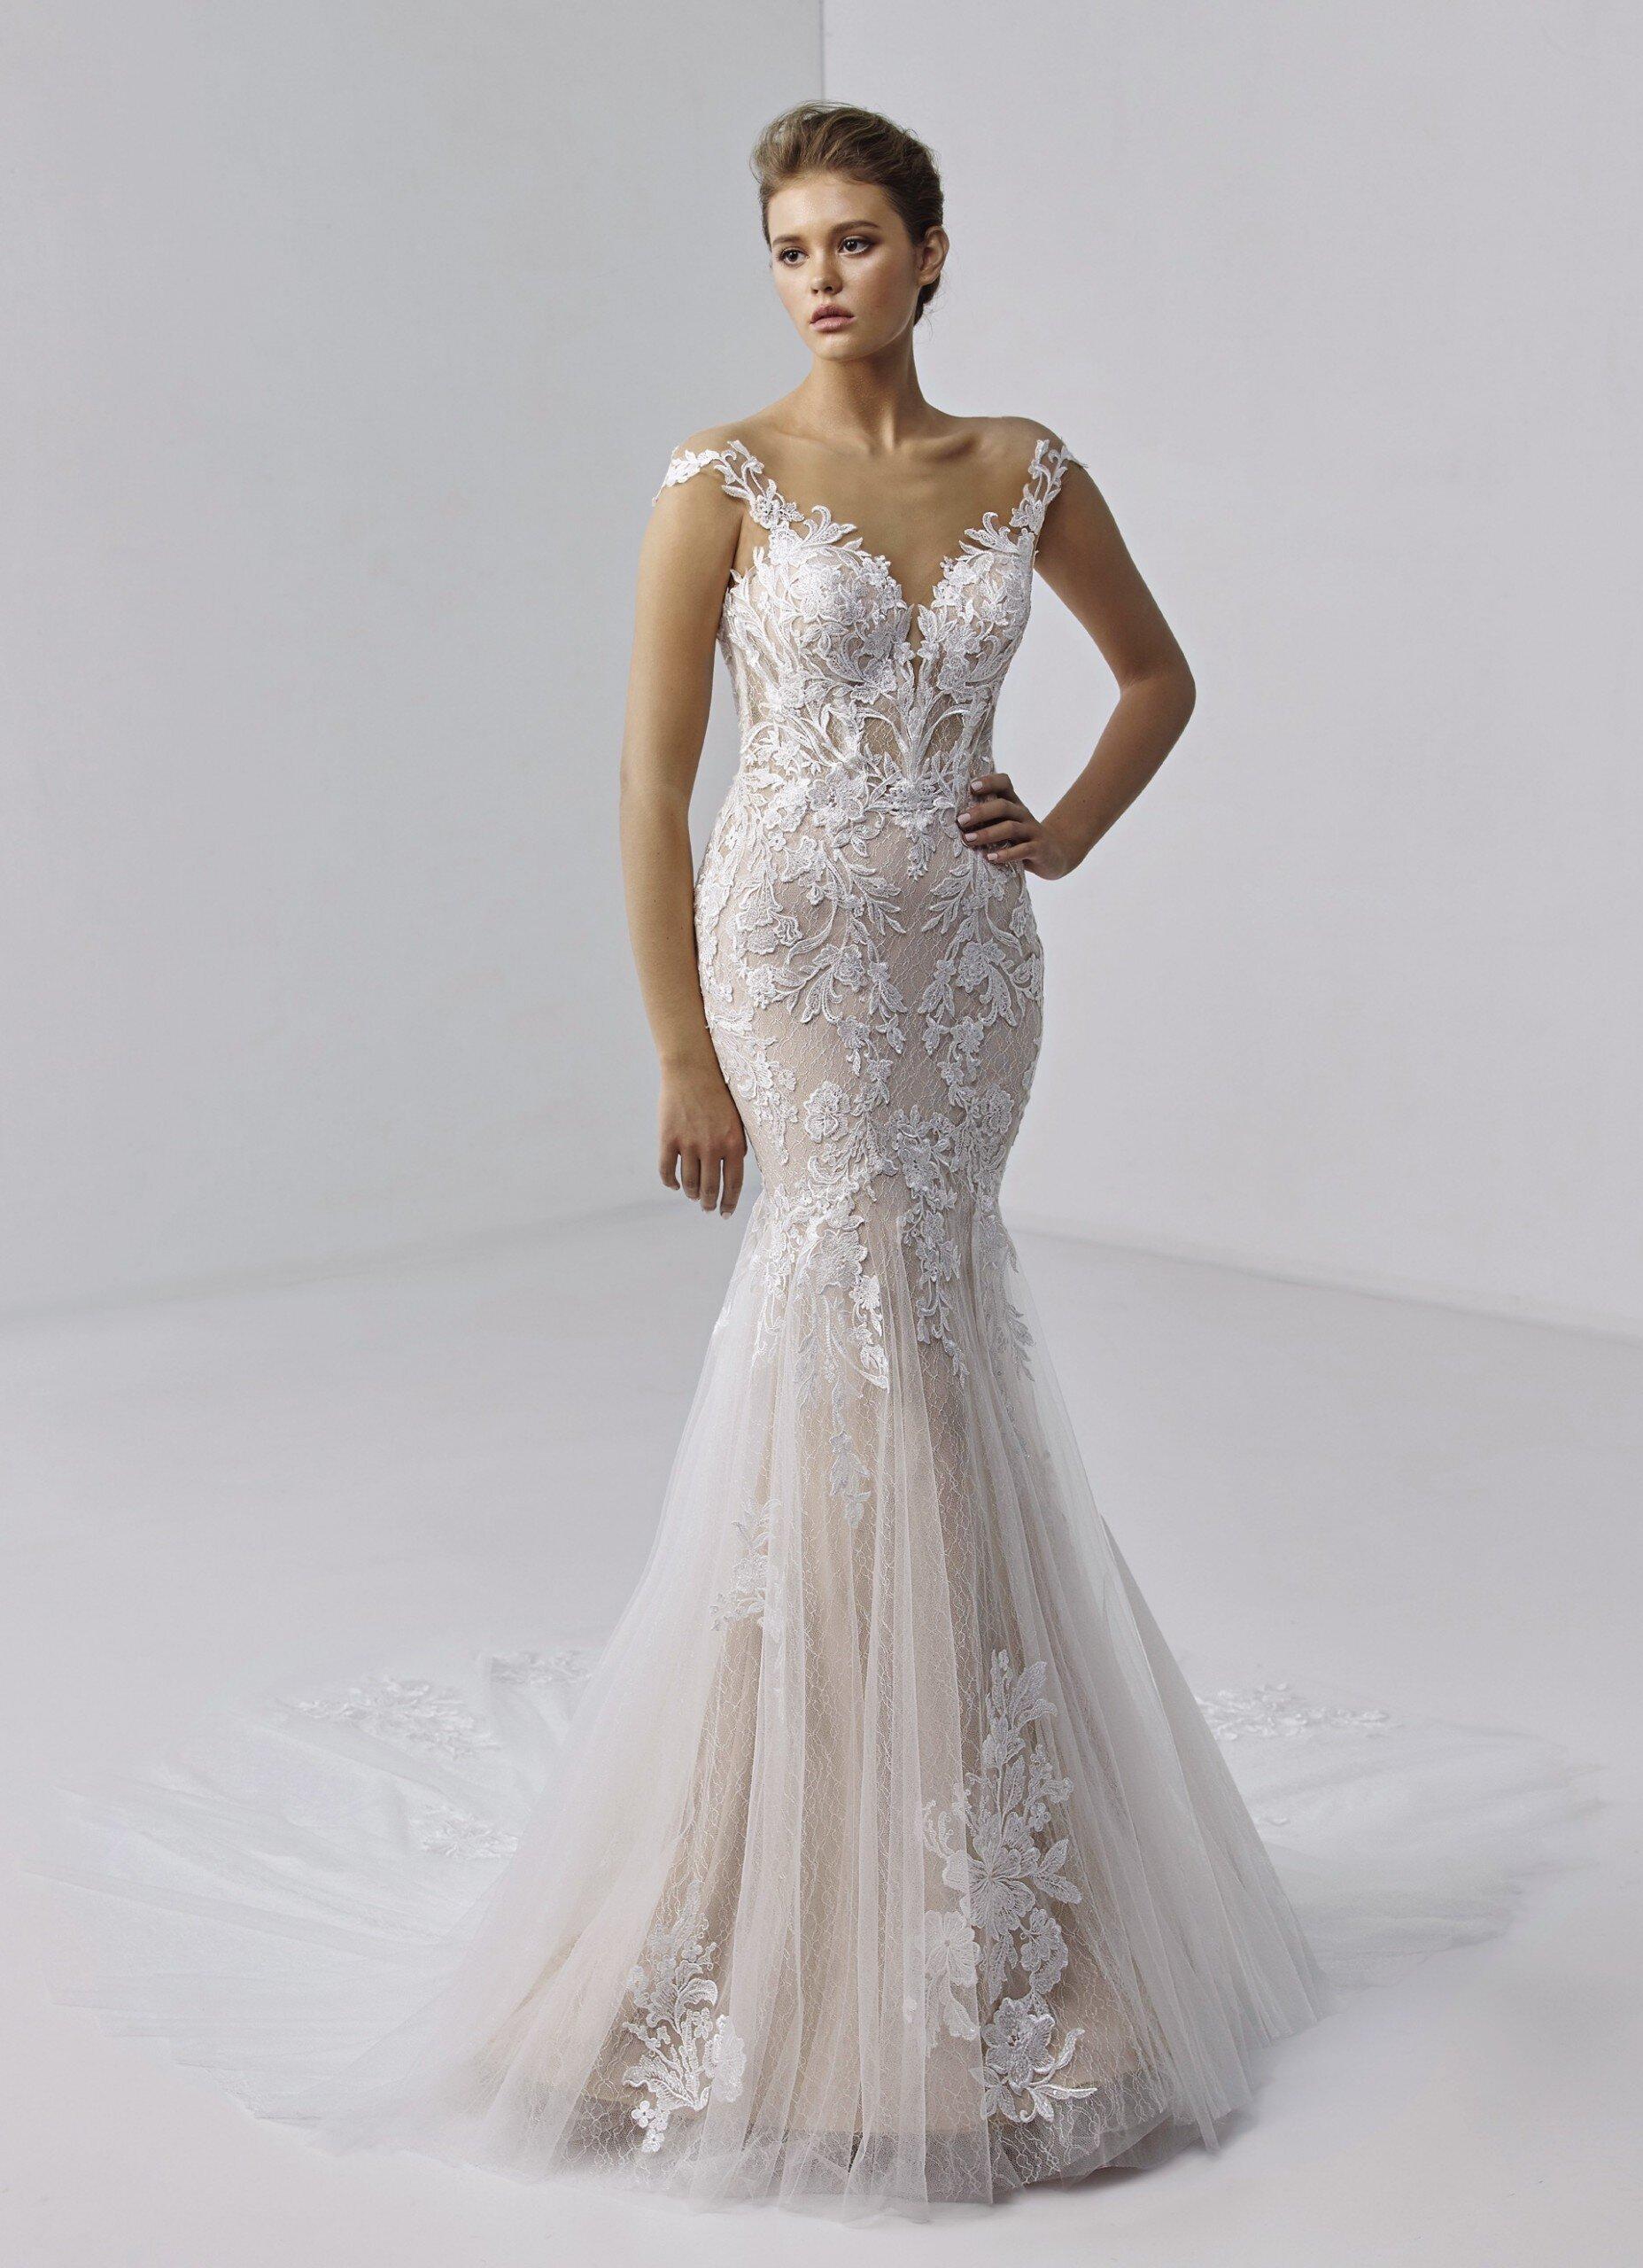 Etoile Brautmode Kollektion 2021 Modell Stephanie